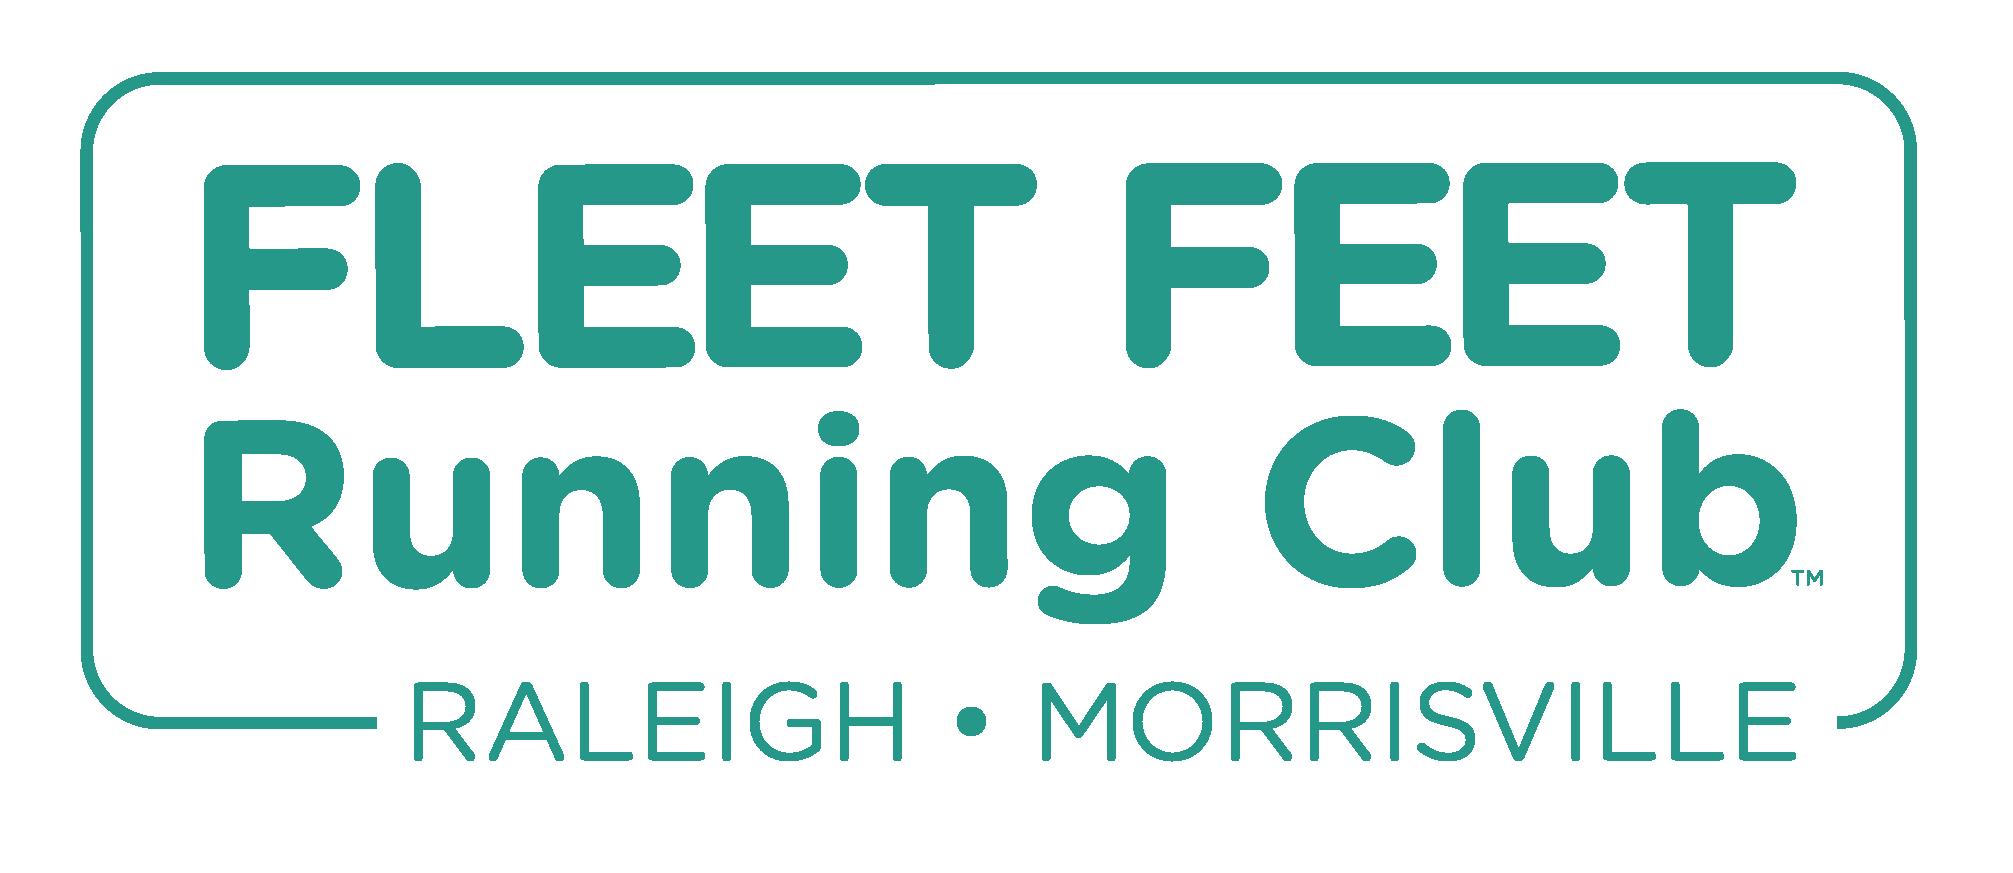 ff raleigh-morrisville running club logo